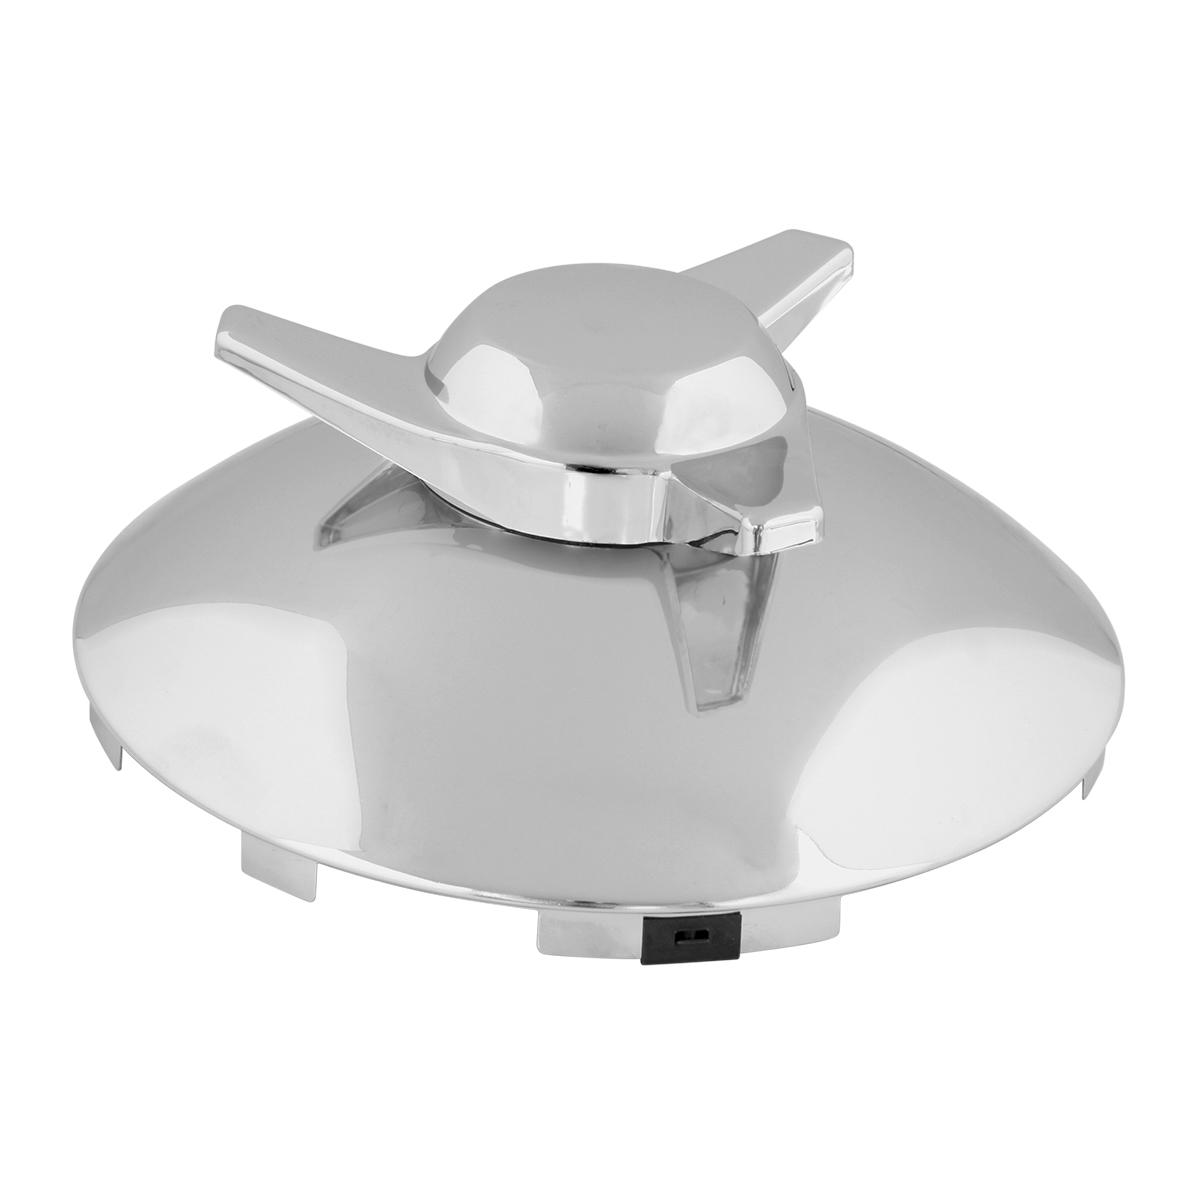 Full Moon Rear Hub Cap GG Grand General 20100 Chrome Plated Steel 8-1//4 8-1//4 Inches I.D